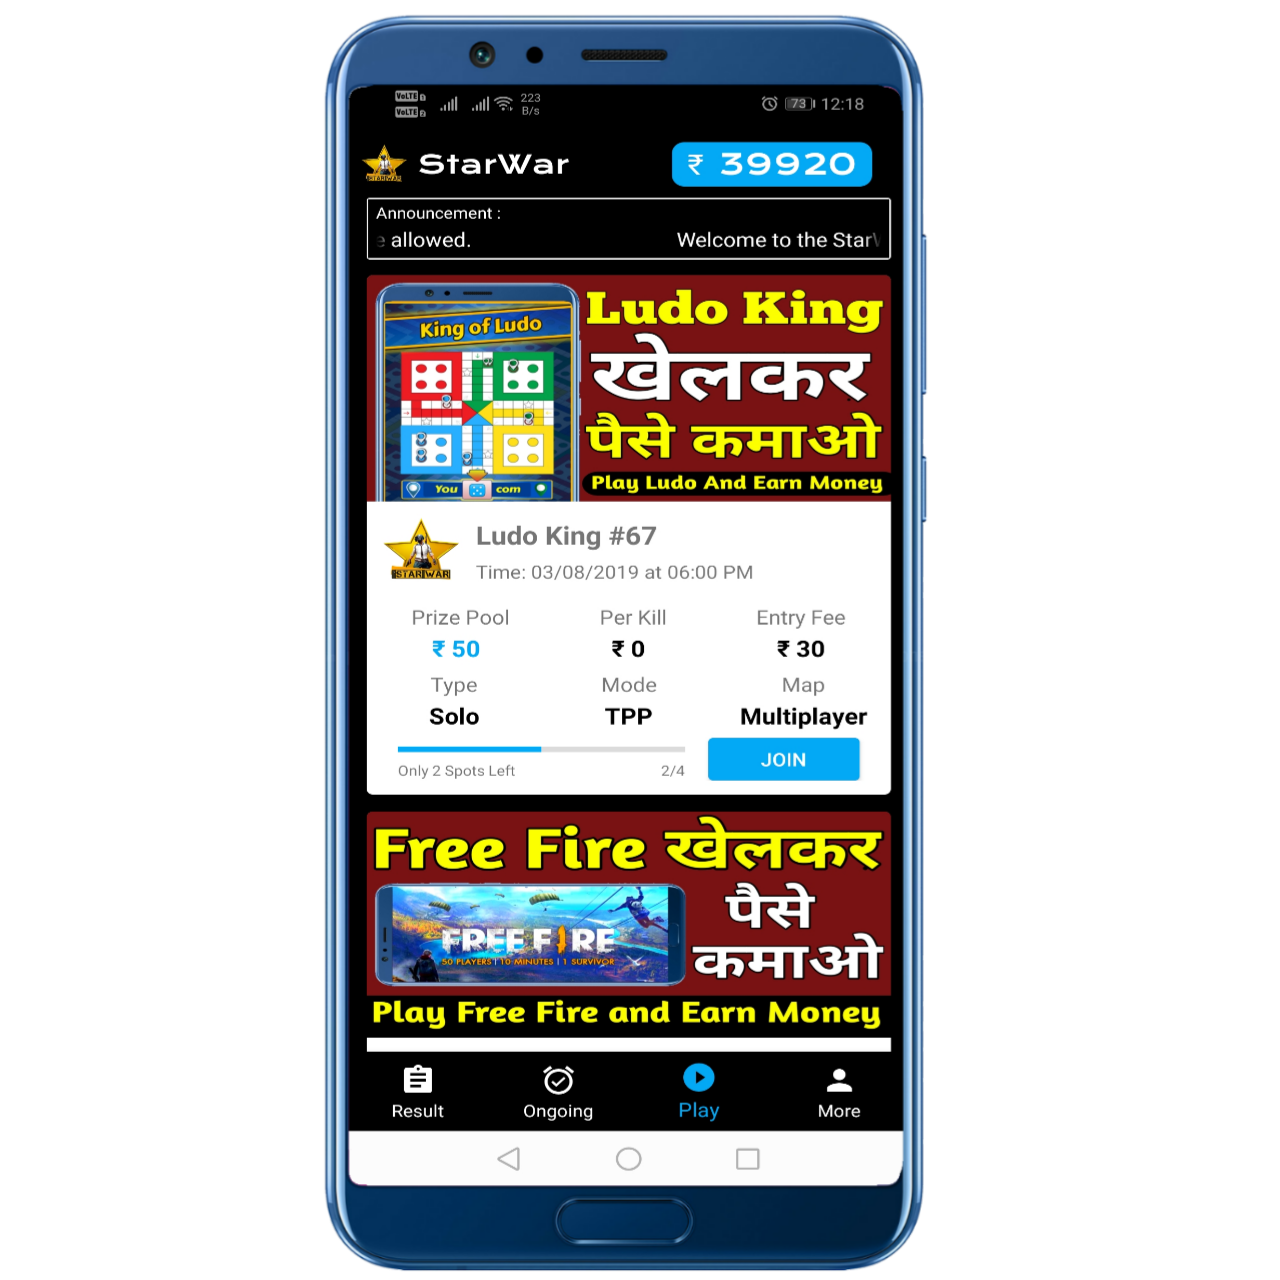 Best Pubg Tournament App - StarWar